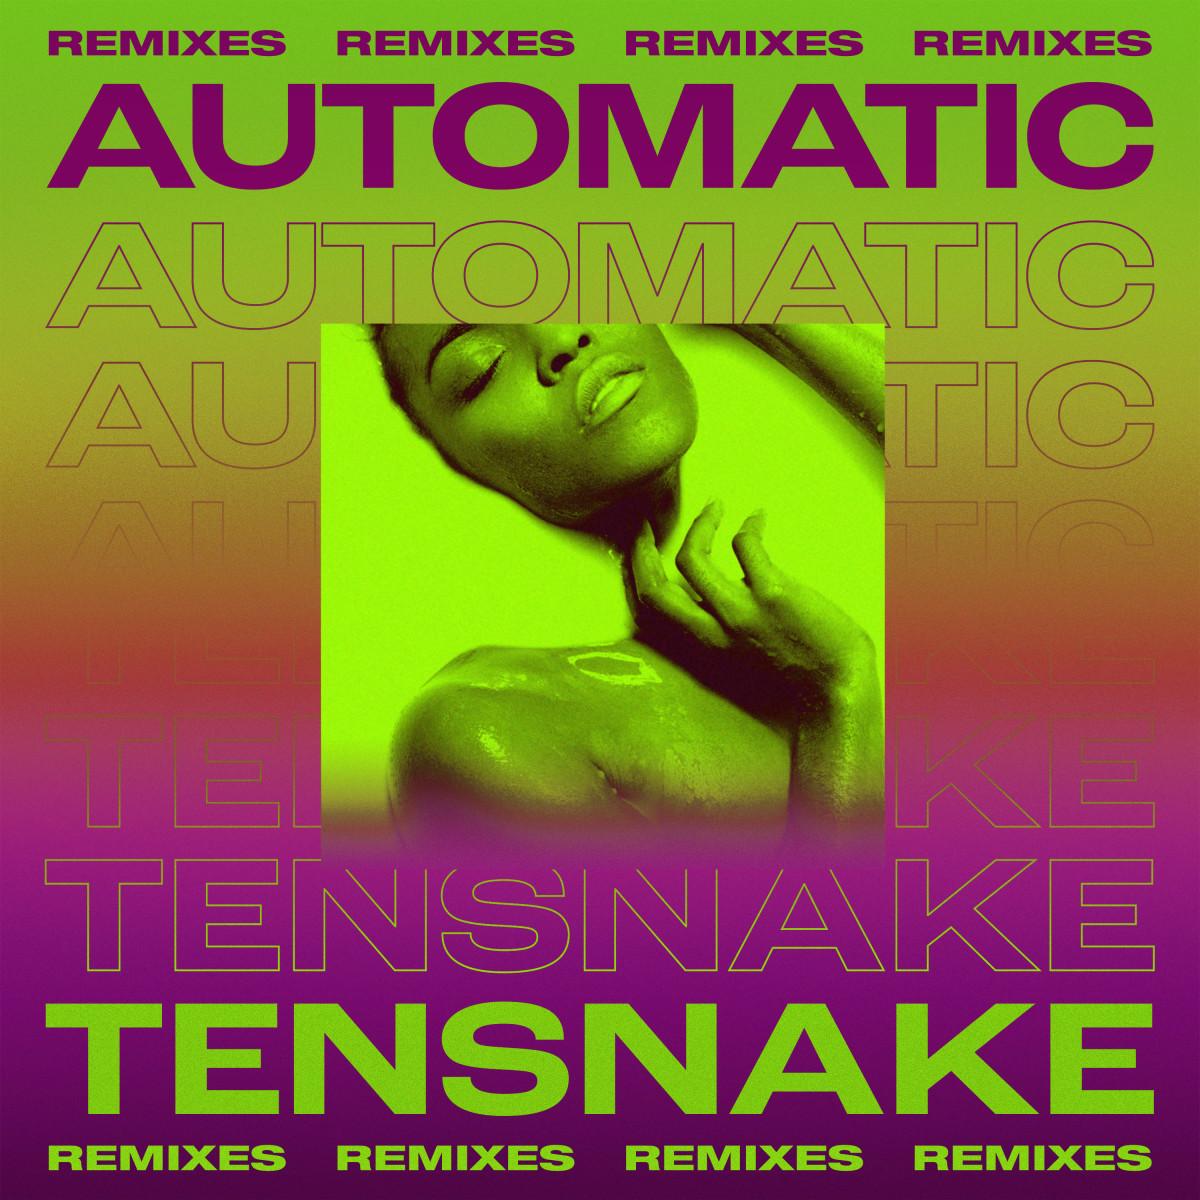 Tensnake - Automatic (Remixes) Art